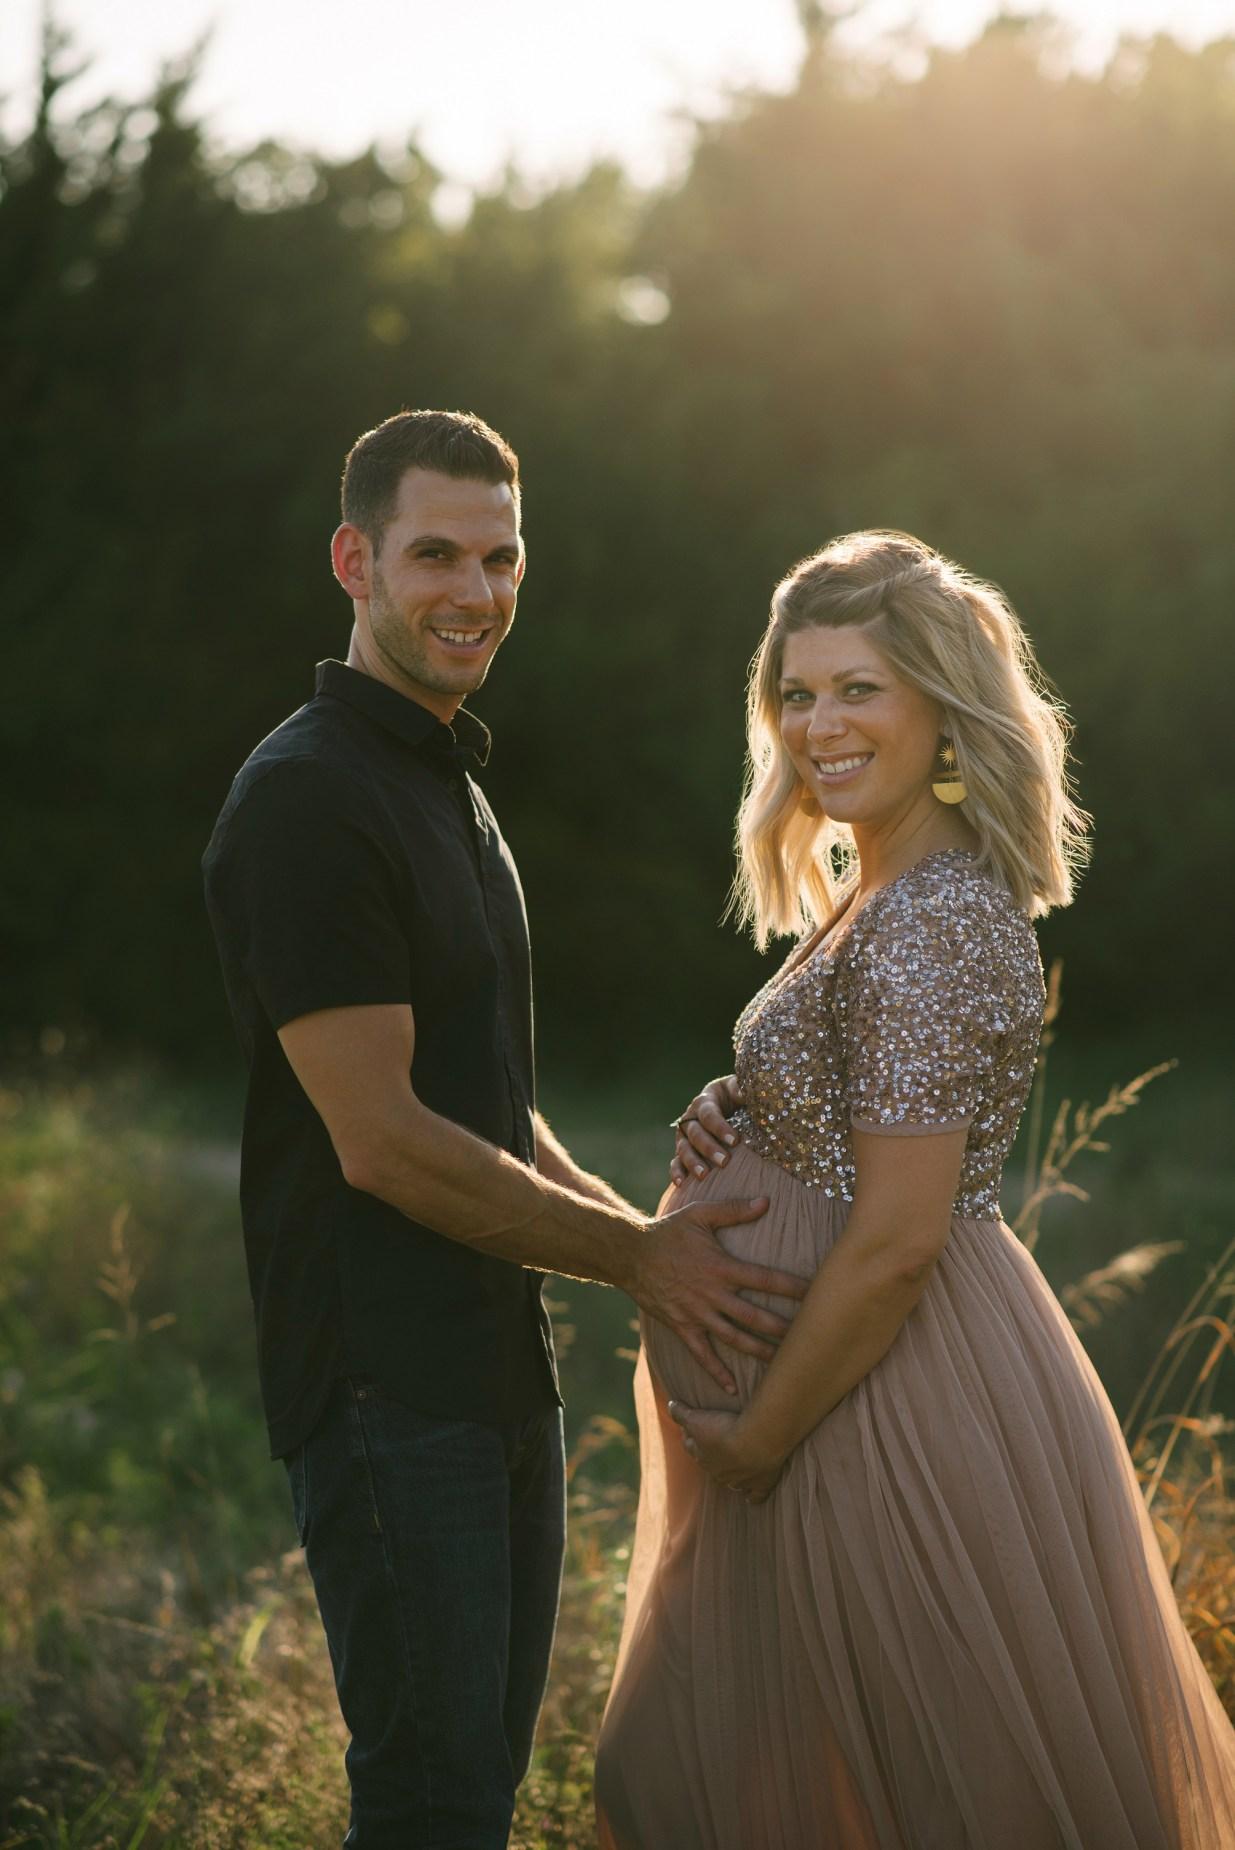 bohmian ethereal maternity photoshoot